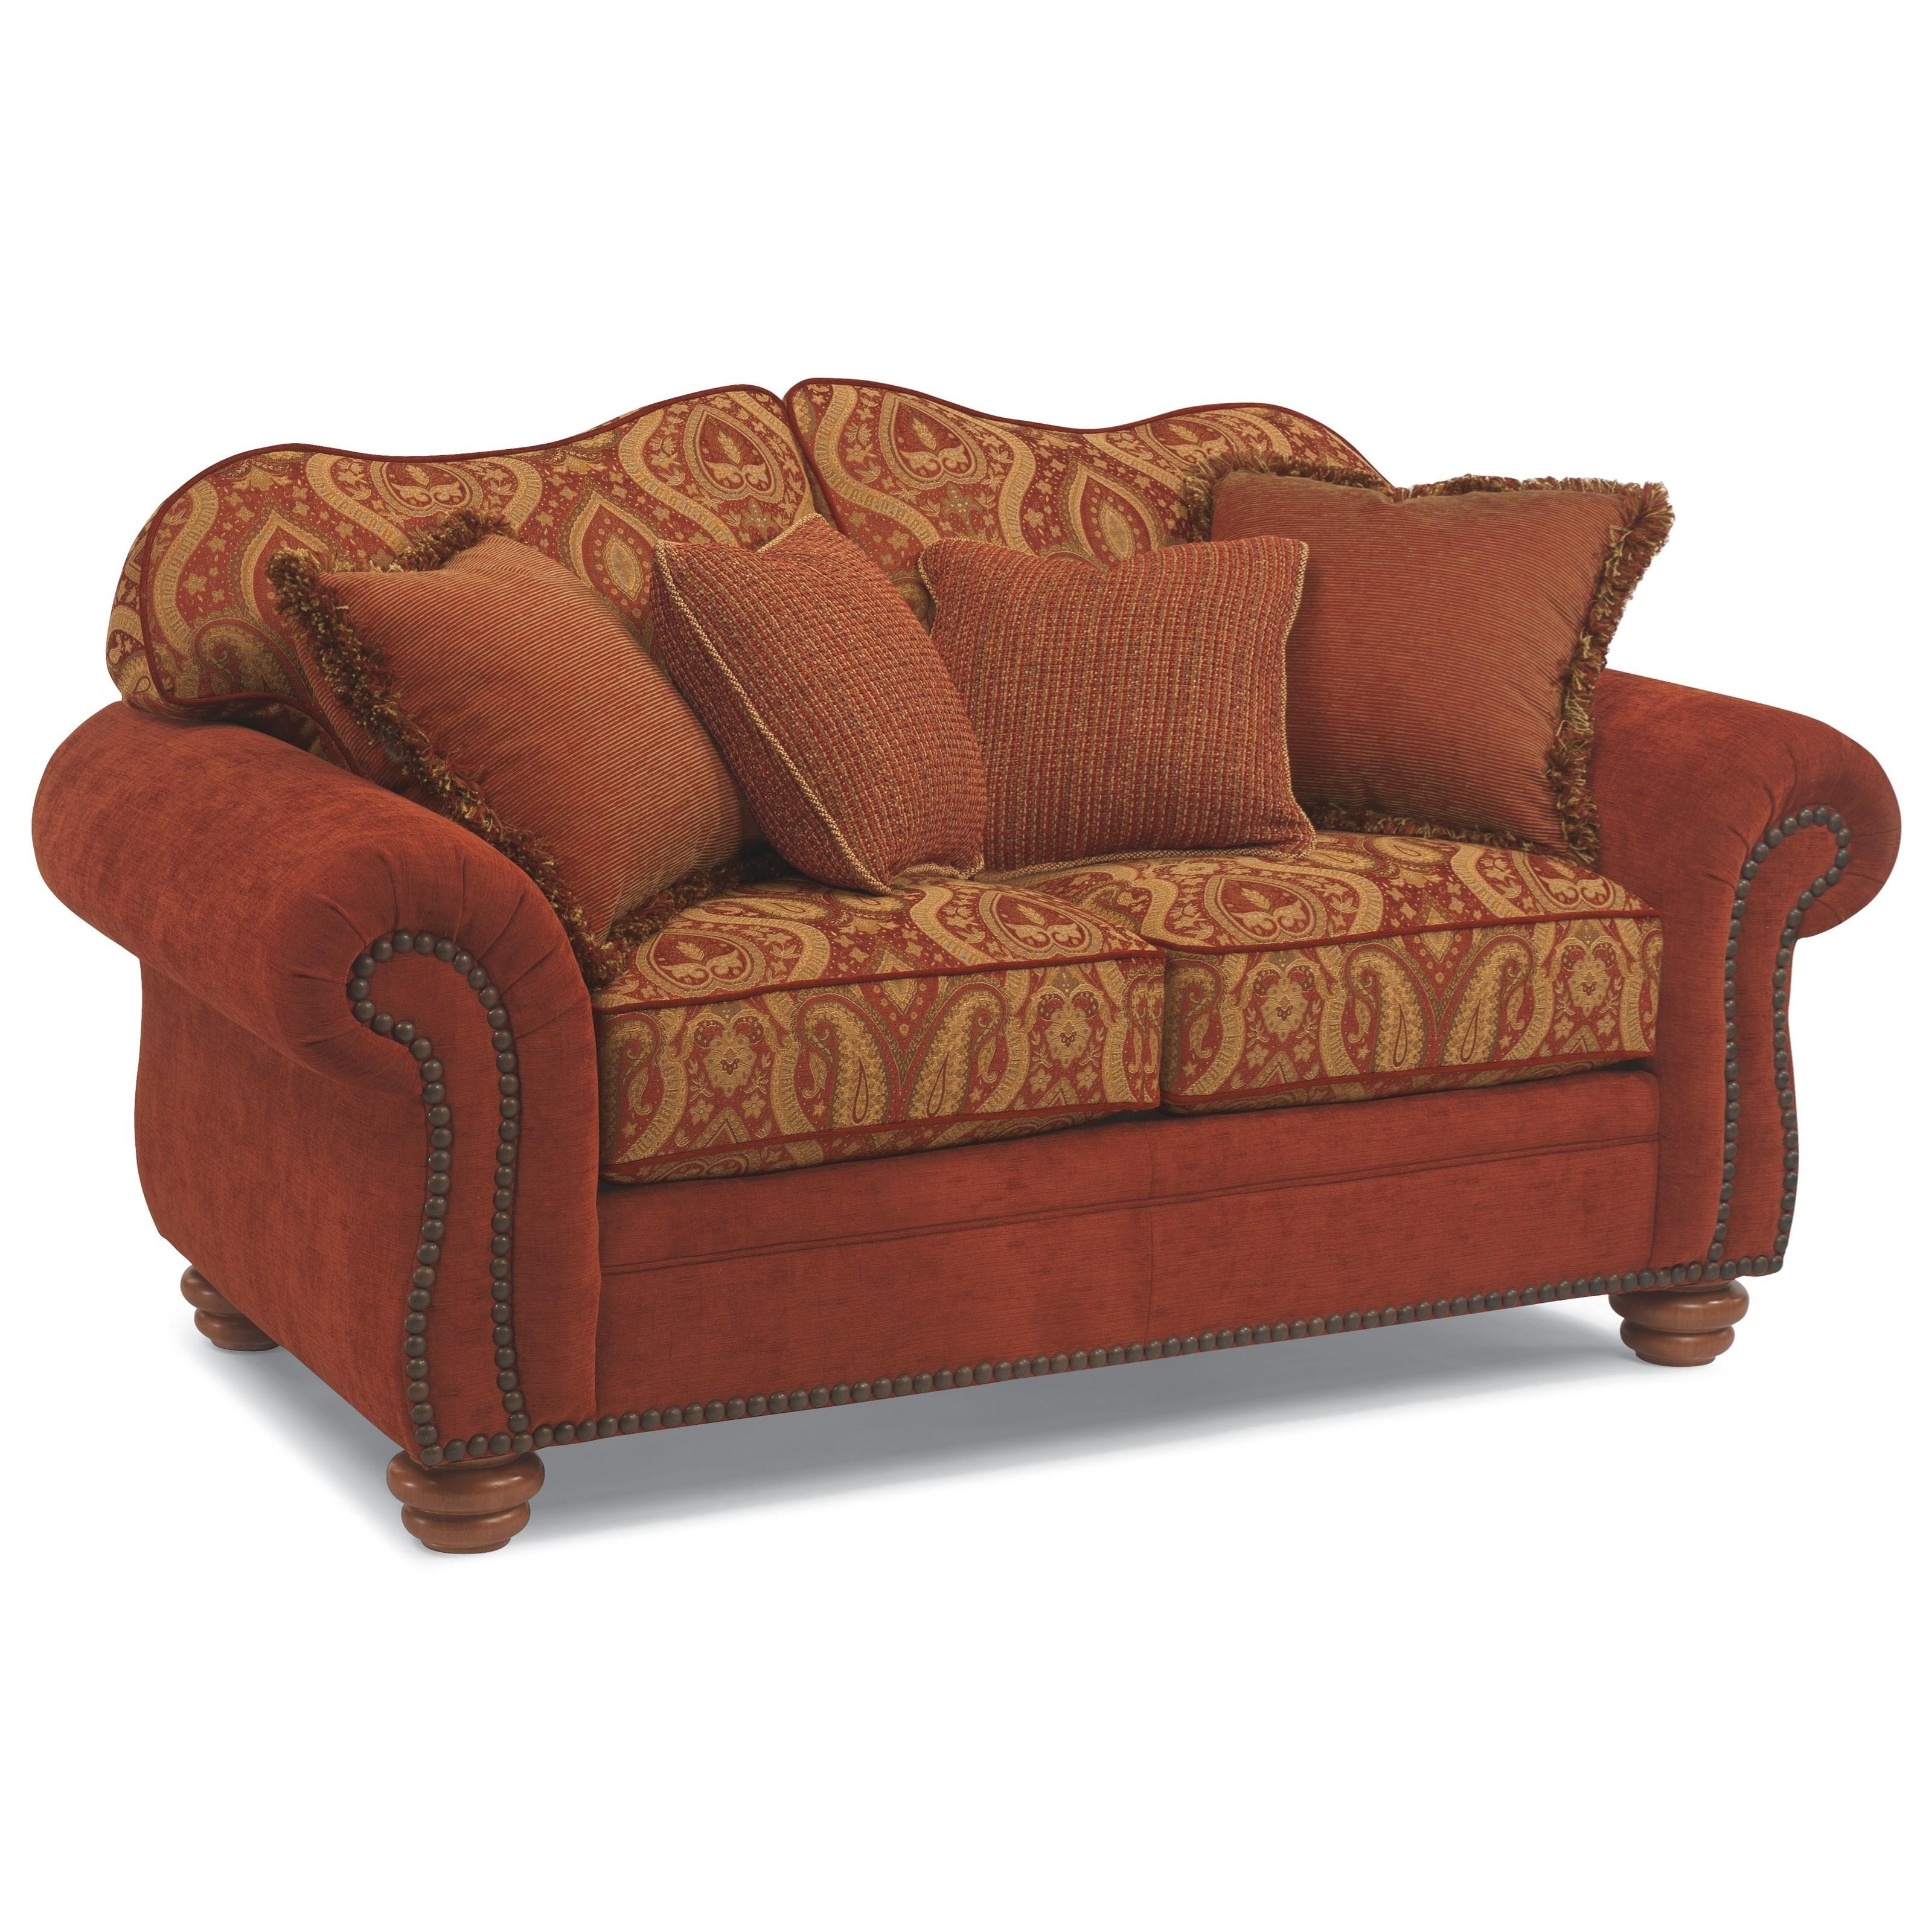 Flexsteel bexley melange love seat with nails wayside for Wayside furniture